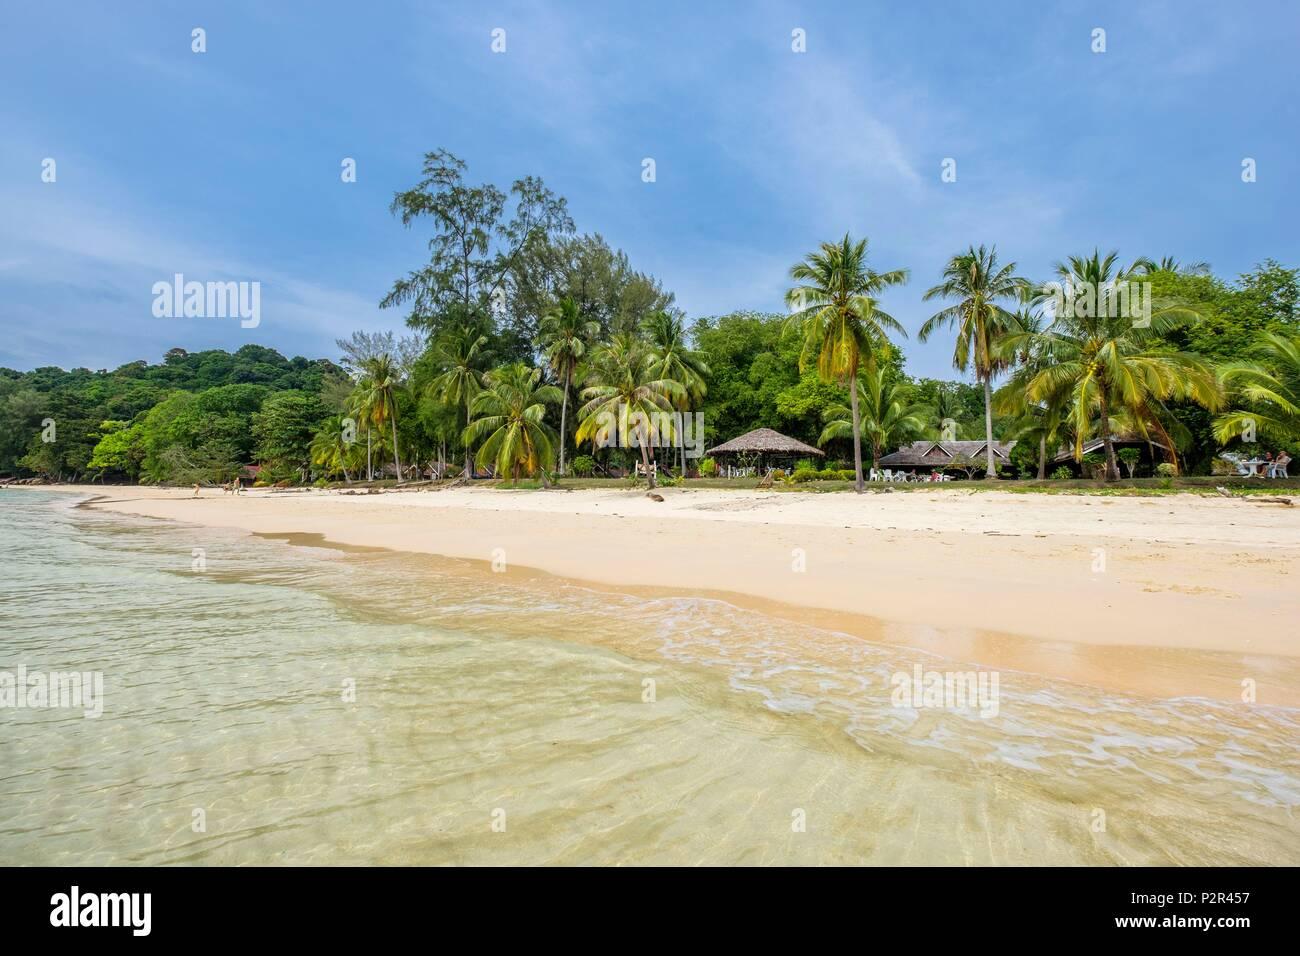 Thailand, Satun province, Mu Ko Phetra Marine National Park, Ko Bulon Leh island, the large white sand beach to the east of the island and Pansand Resort under the coconut trees - Stock Image